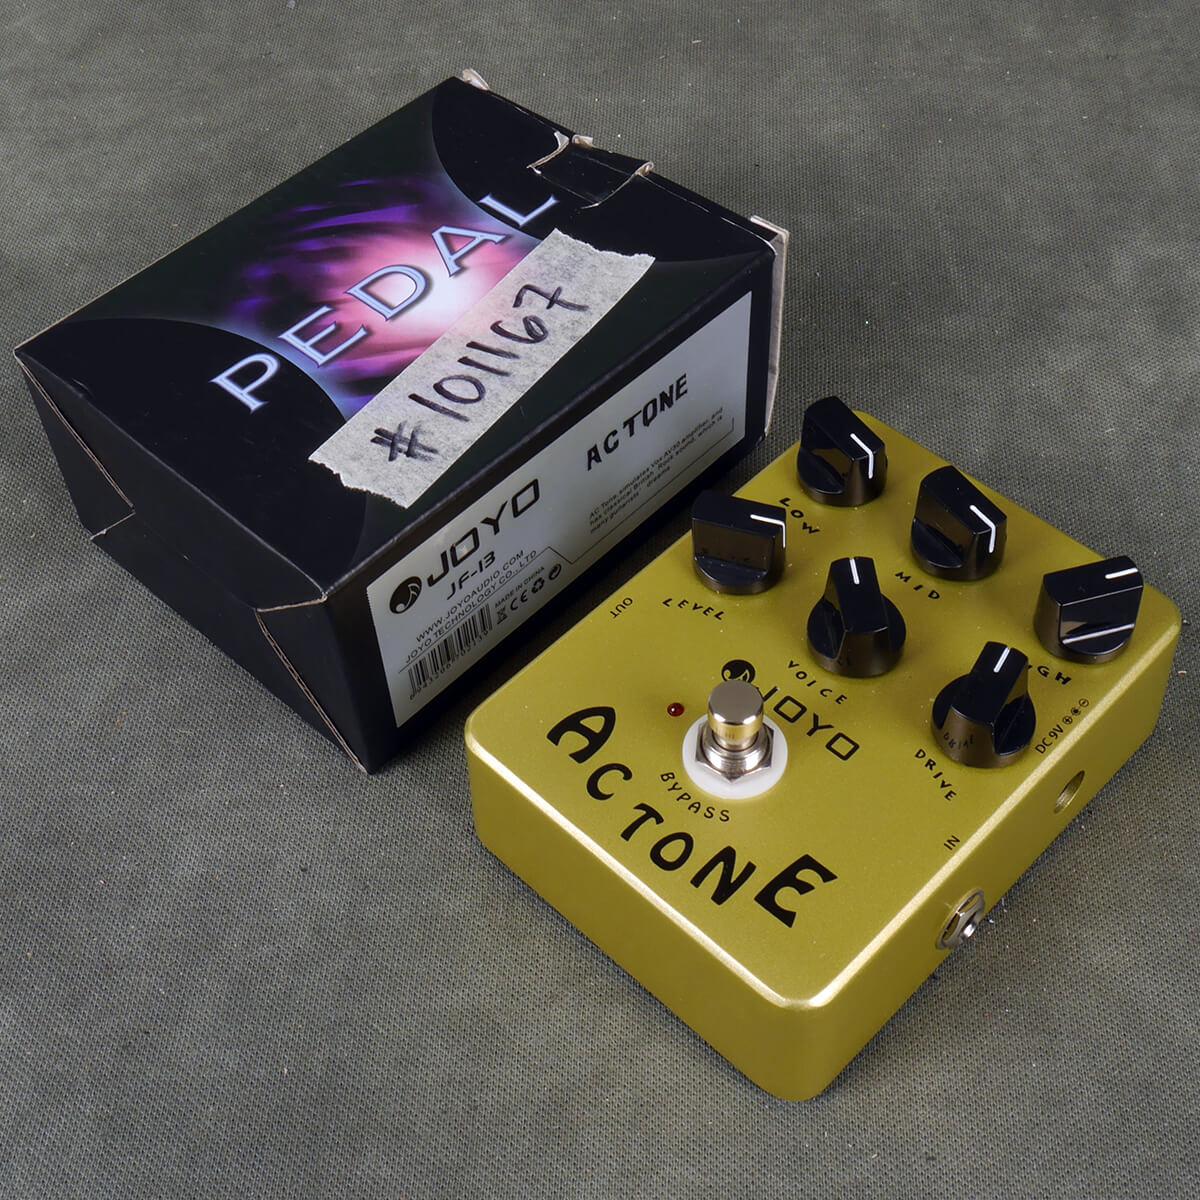 Joyo AC Tone Overdrive FX Pedal w/Box - 2nd Hand